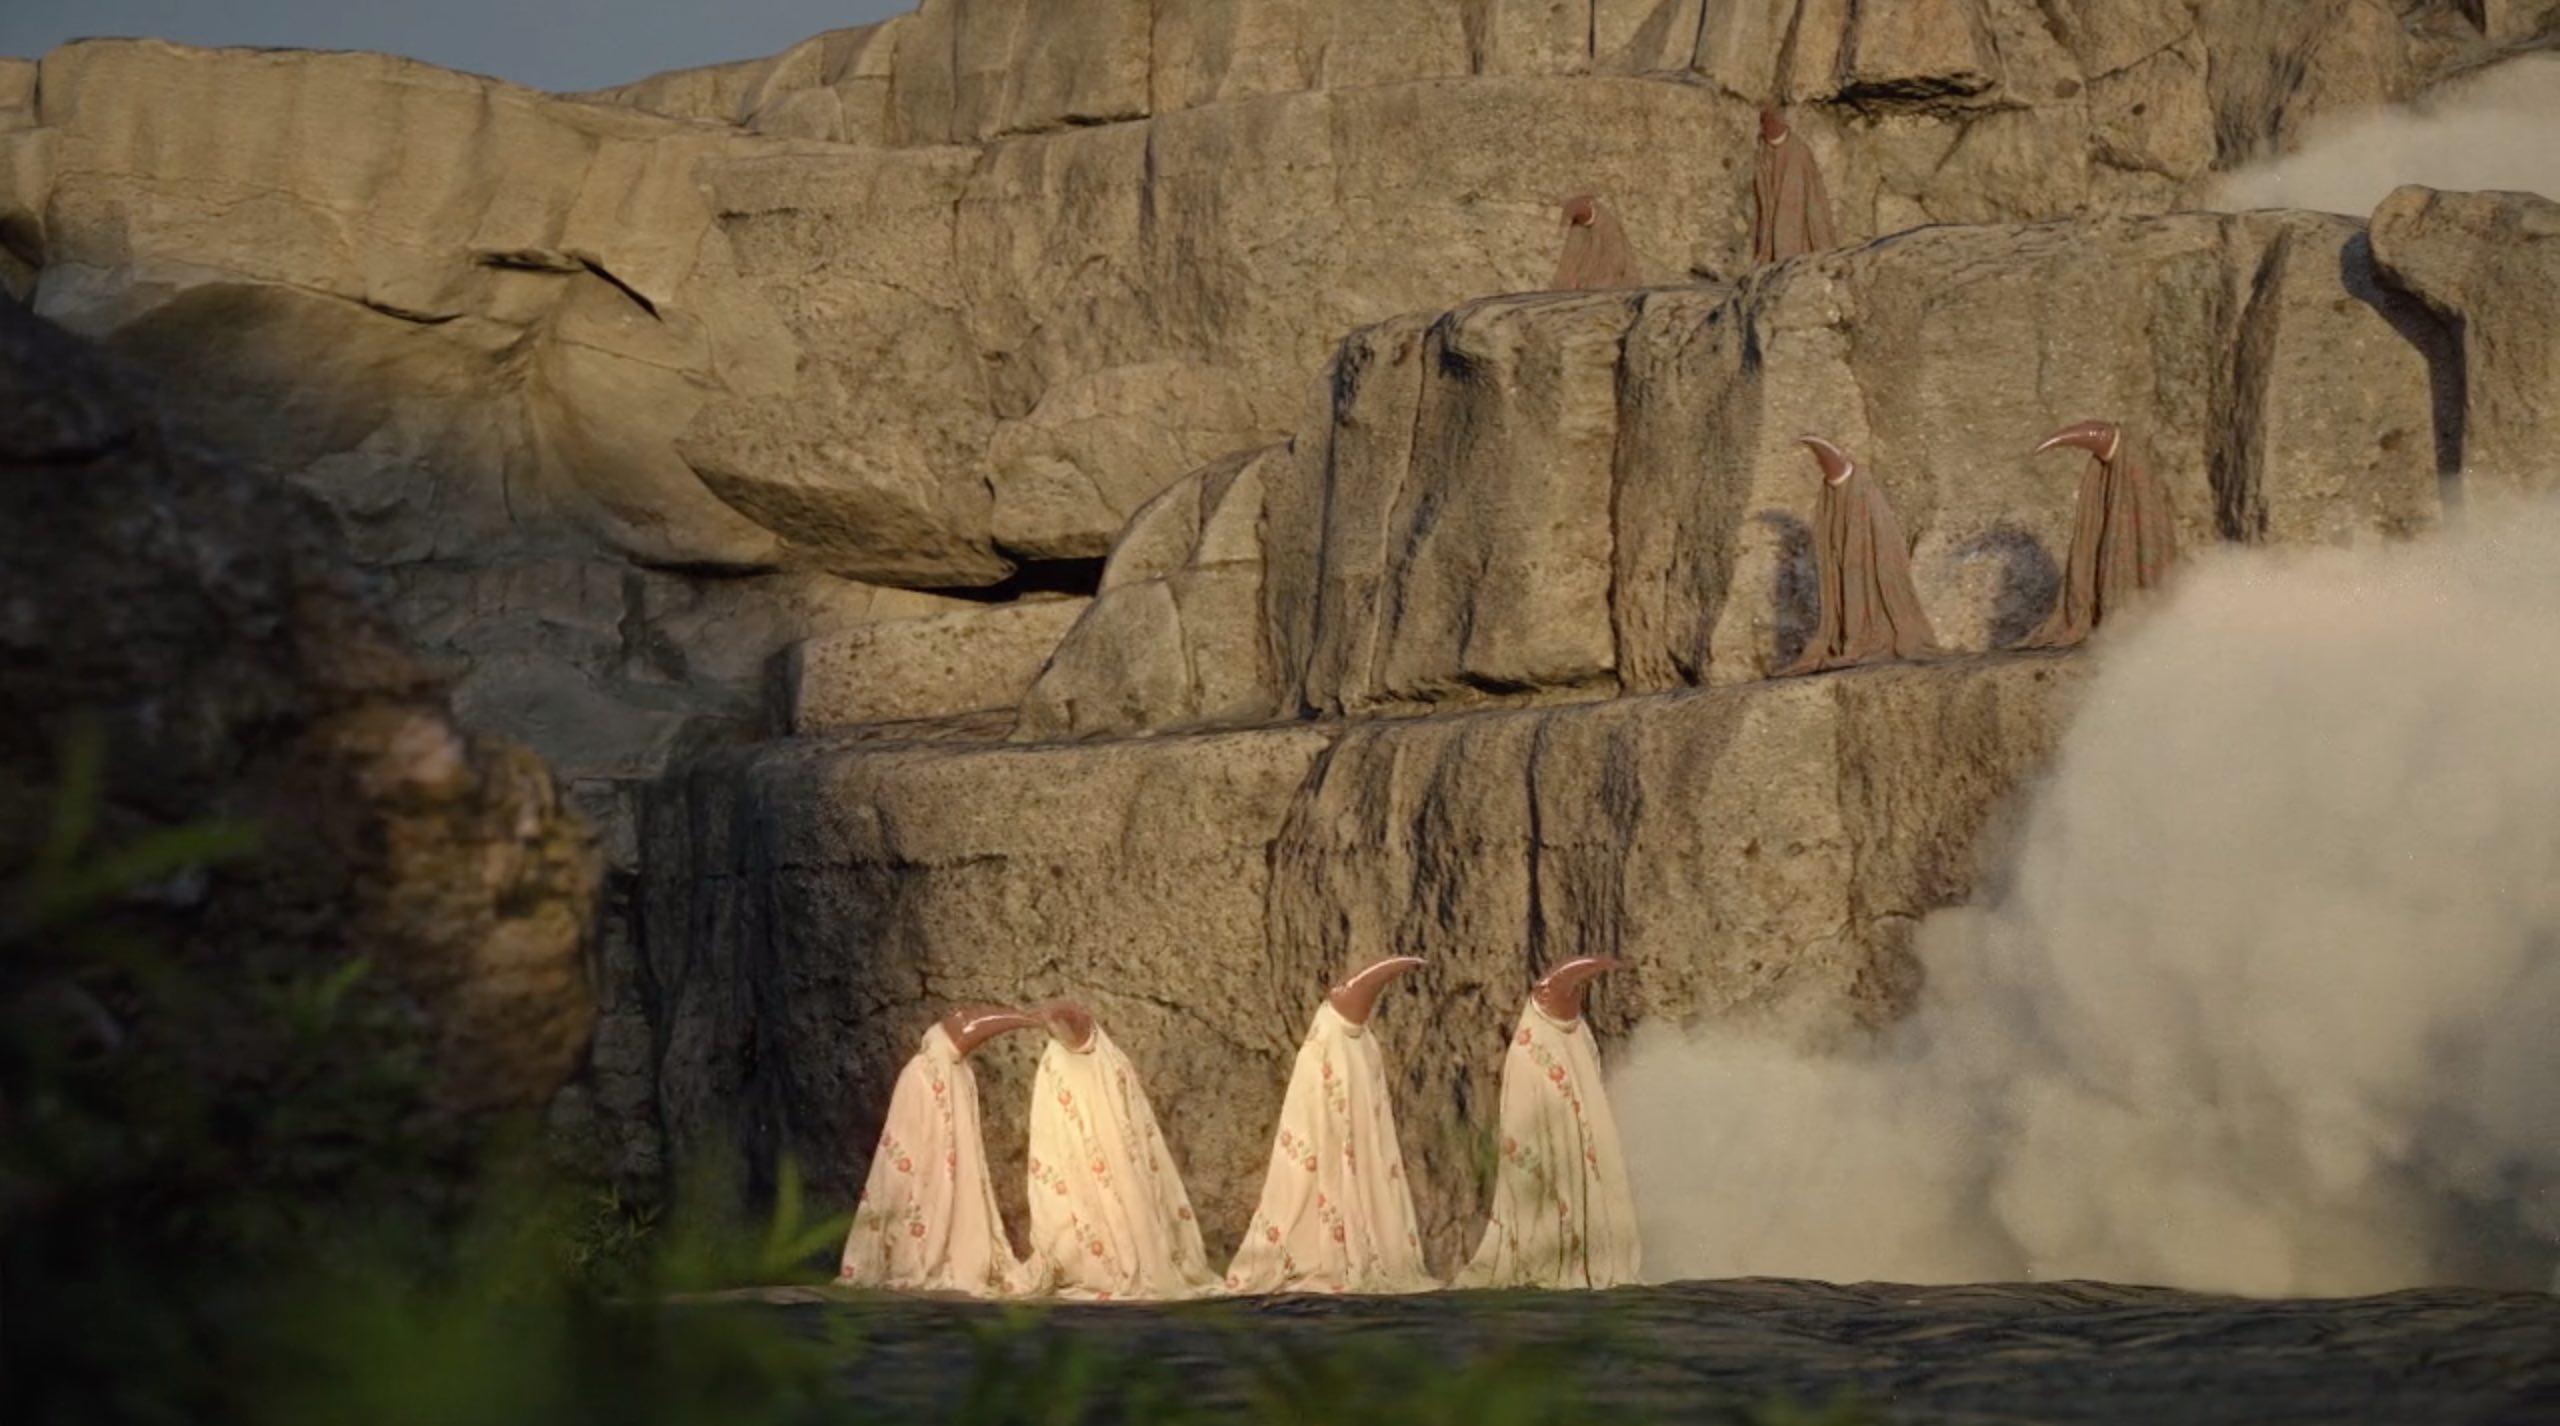 Furnace of the Birds by Arsen Arzumanyan | CGI Short Film